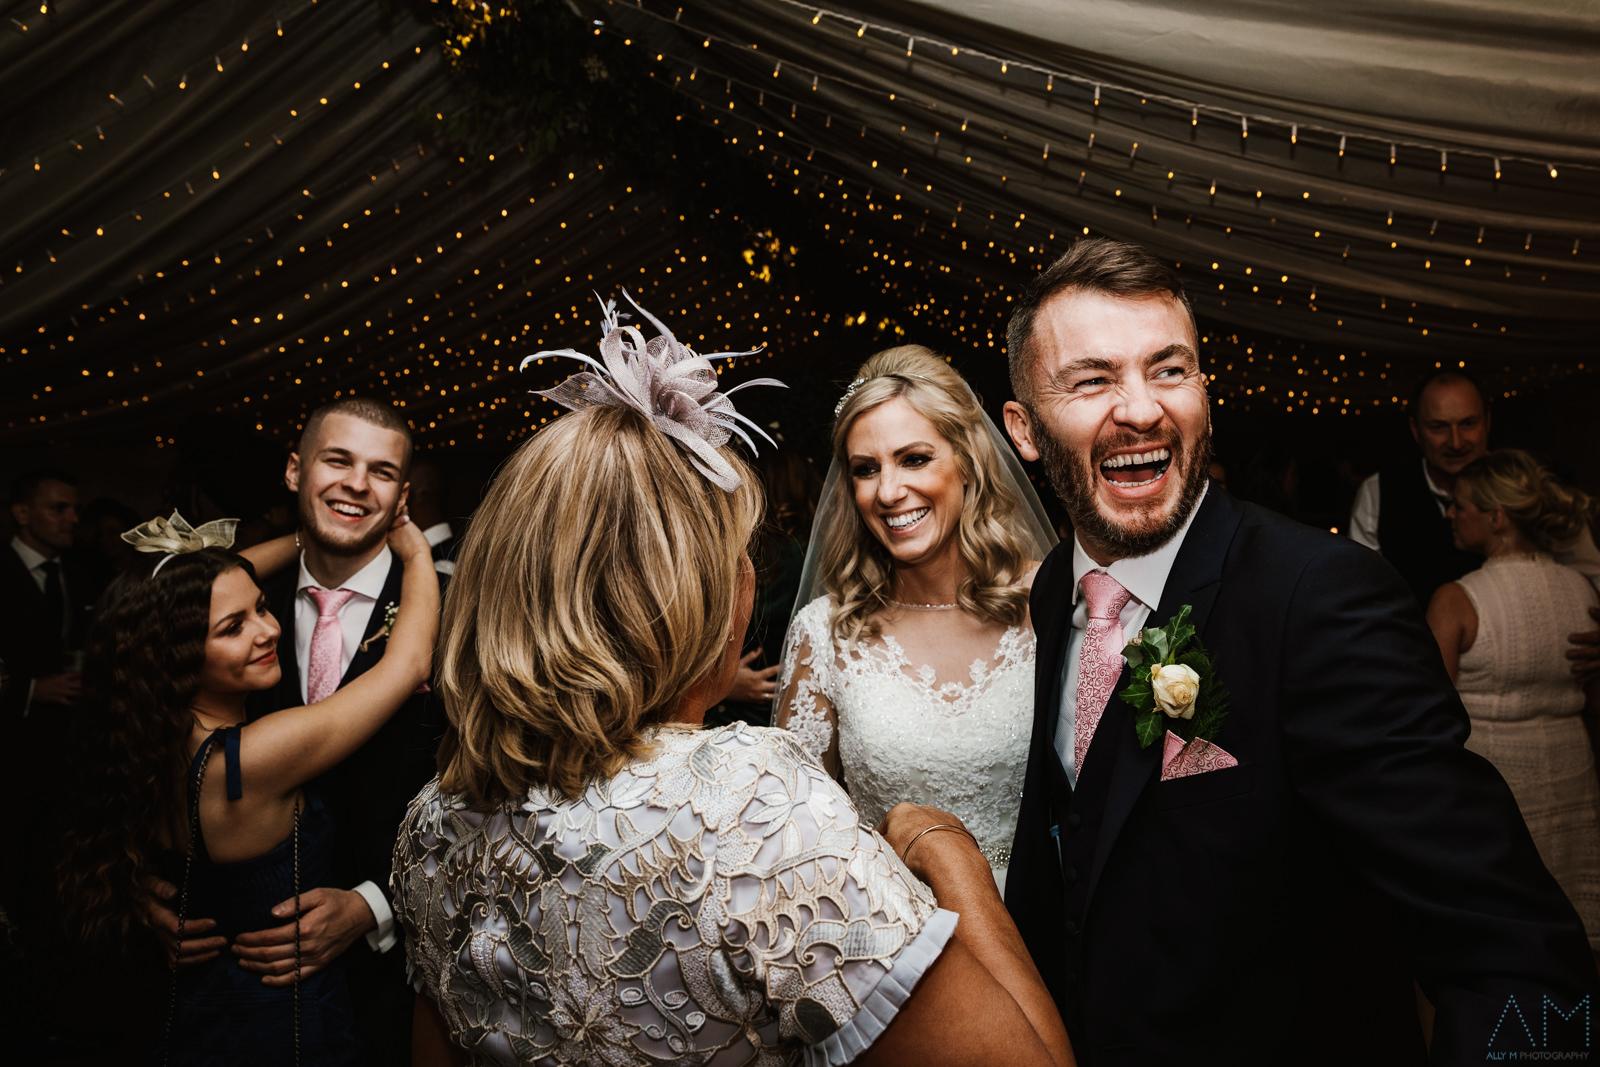 Inn at whitewell wedding fun